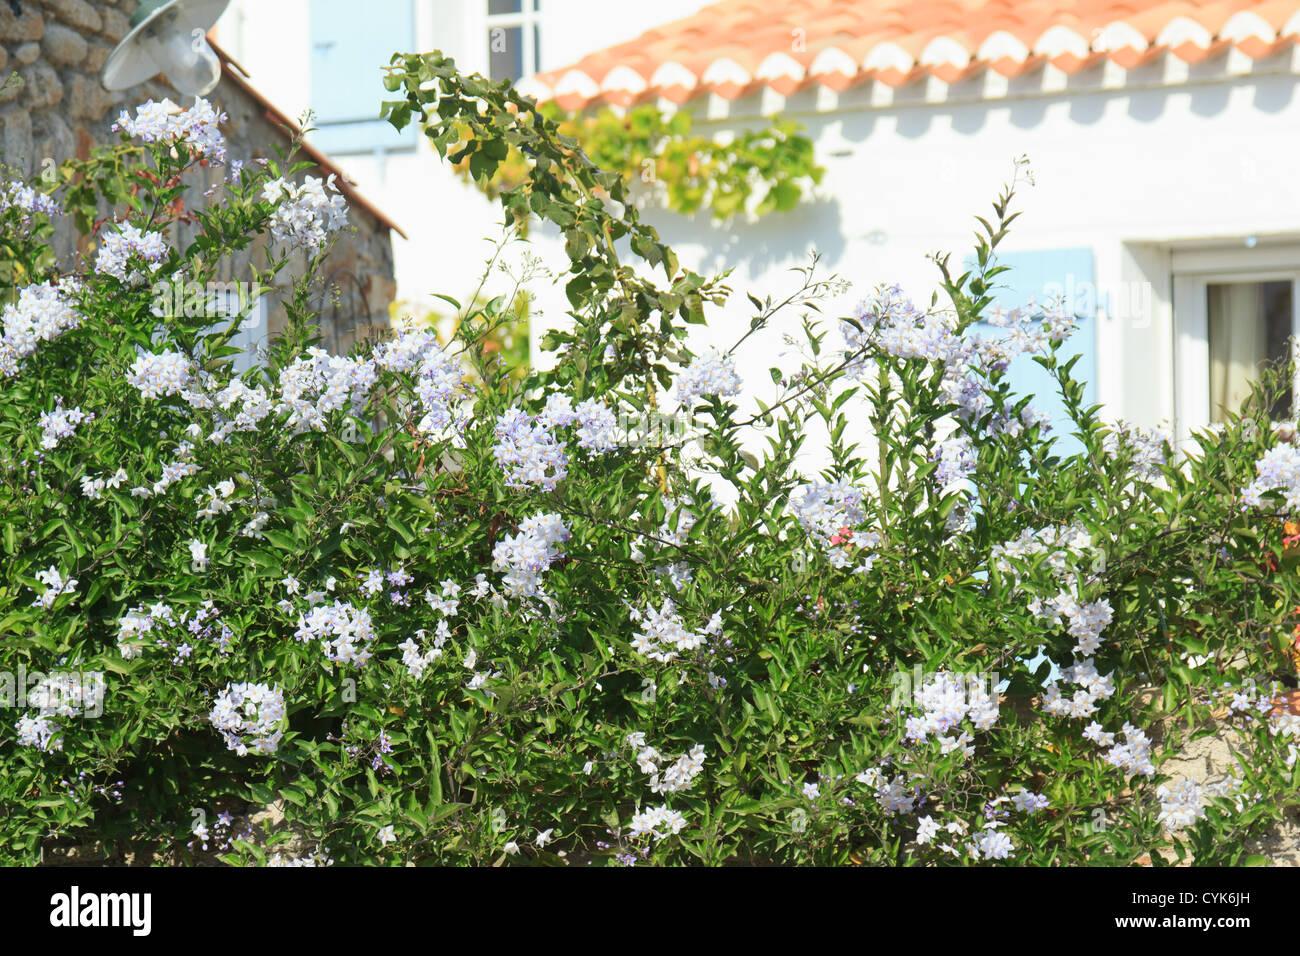 jasmine nightshade solanum jasminoides solanum laxum france stock photo 51438761 alamy. Black Bedroom Furniture Sets. Home Design Ideas